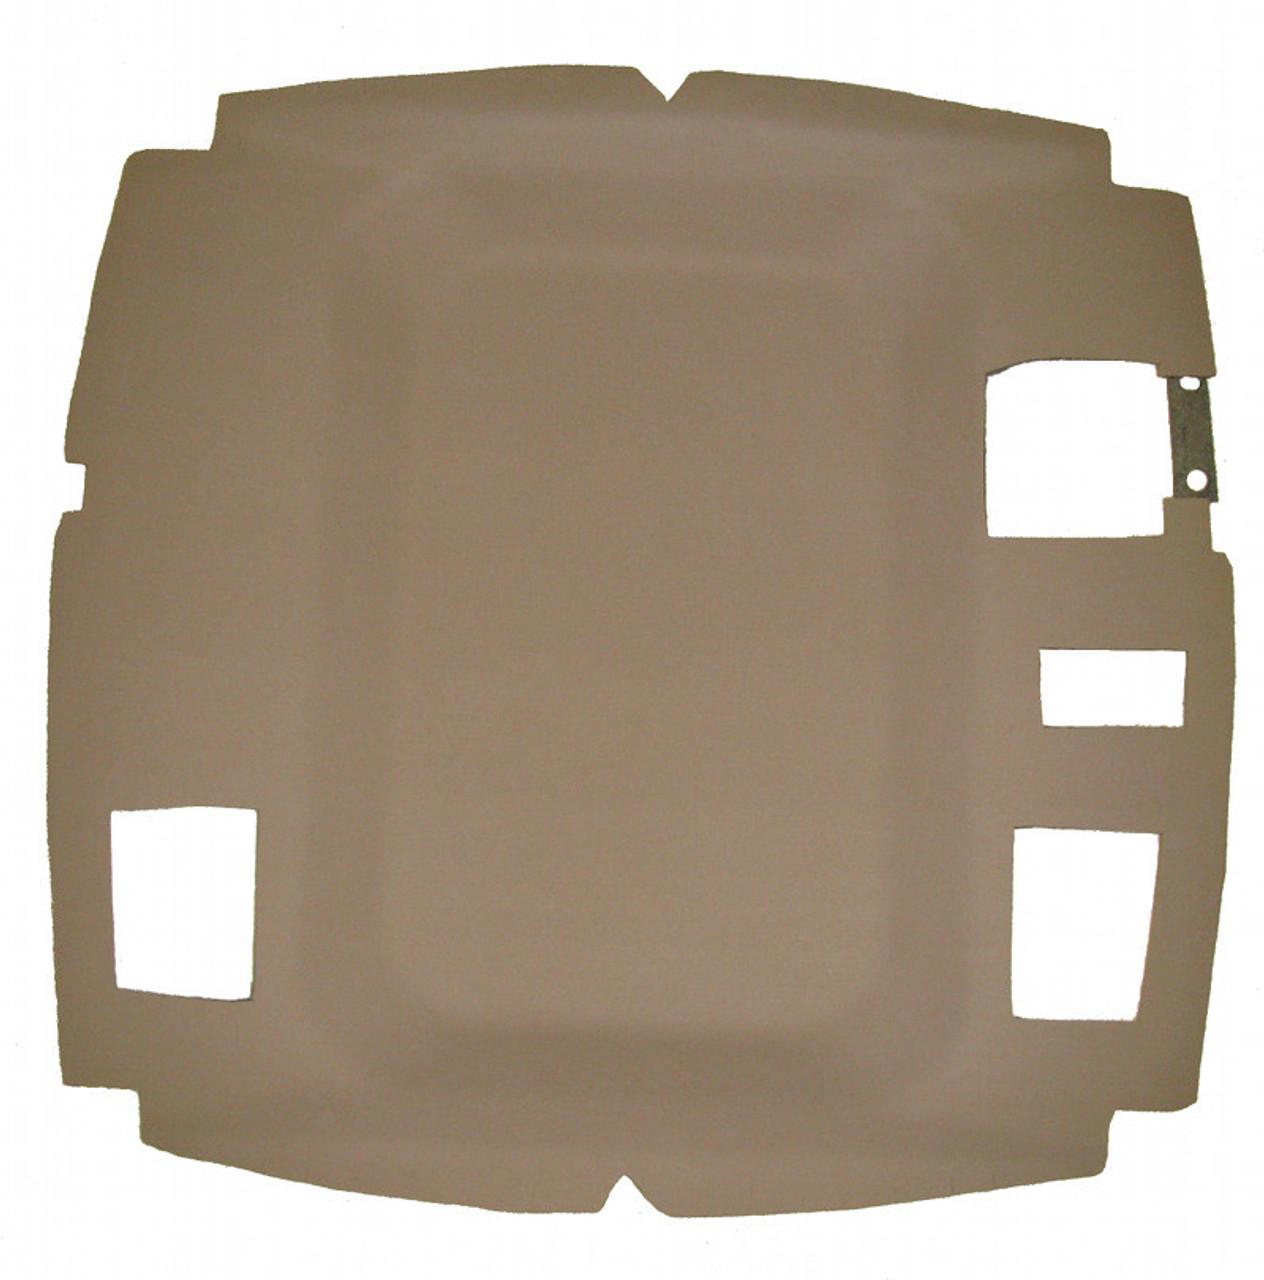 small resolution of  5420 headliner for john deere 6000 series tractor interior upholstery on john deere 6420 wiring diagram